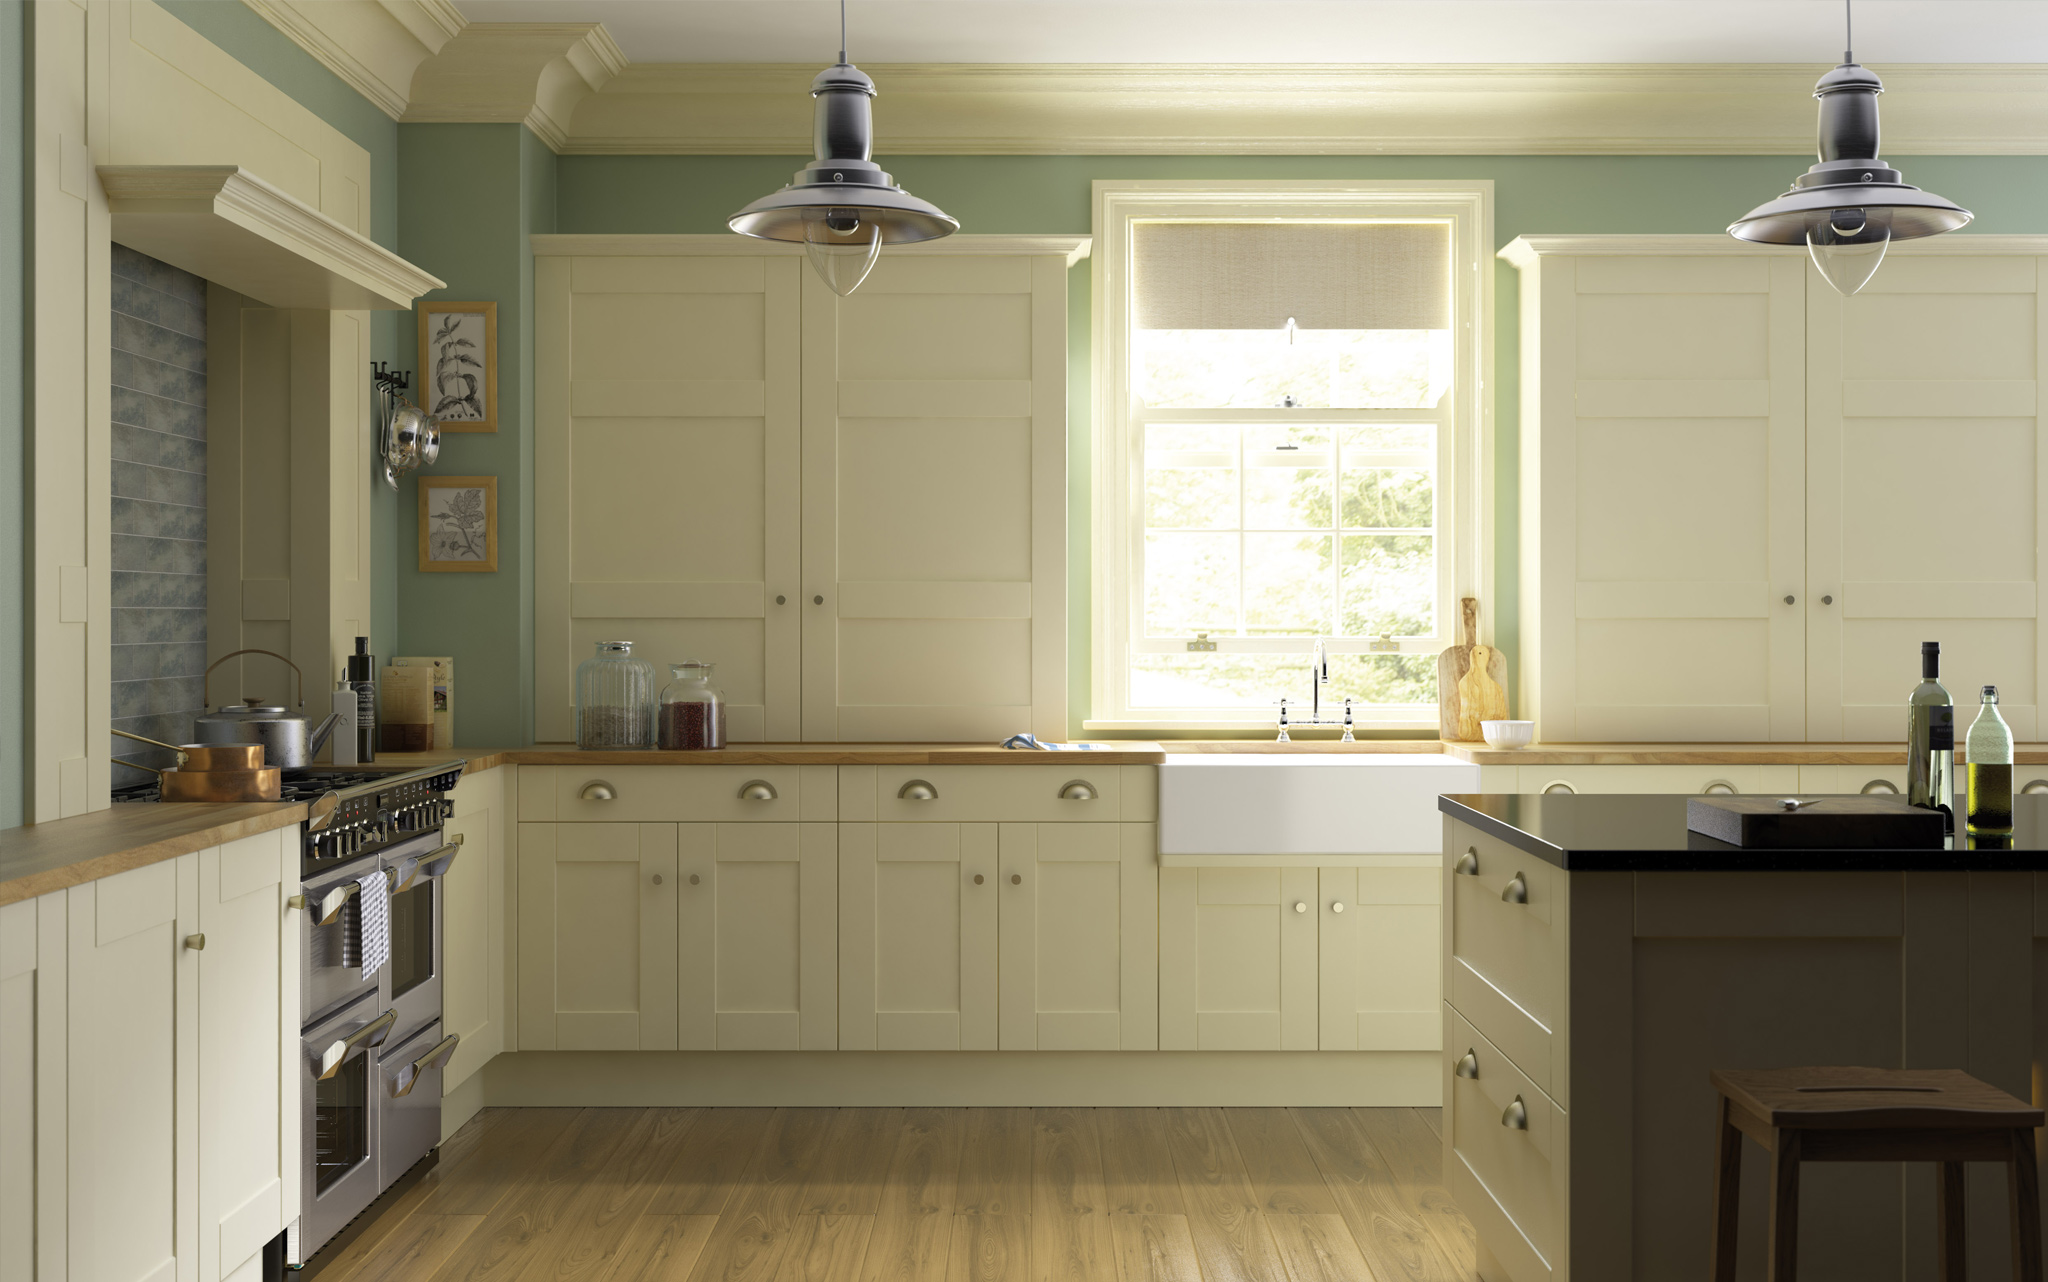 køkken-naturlige-maling-farver